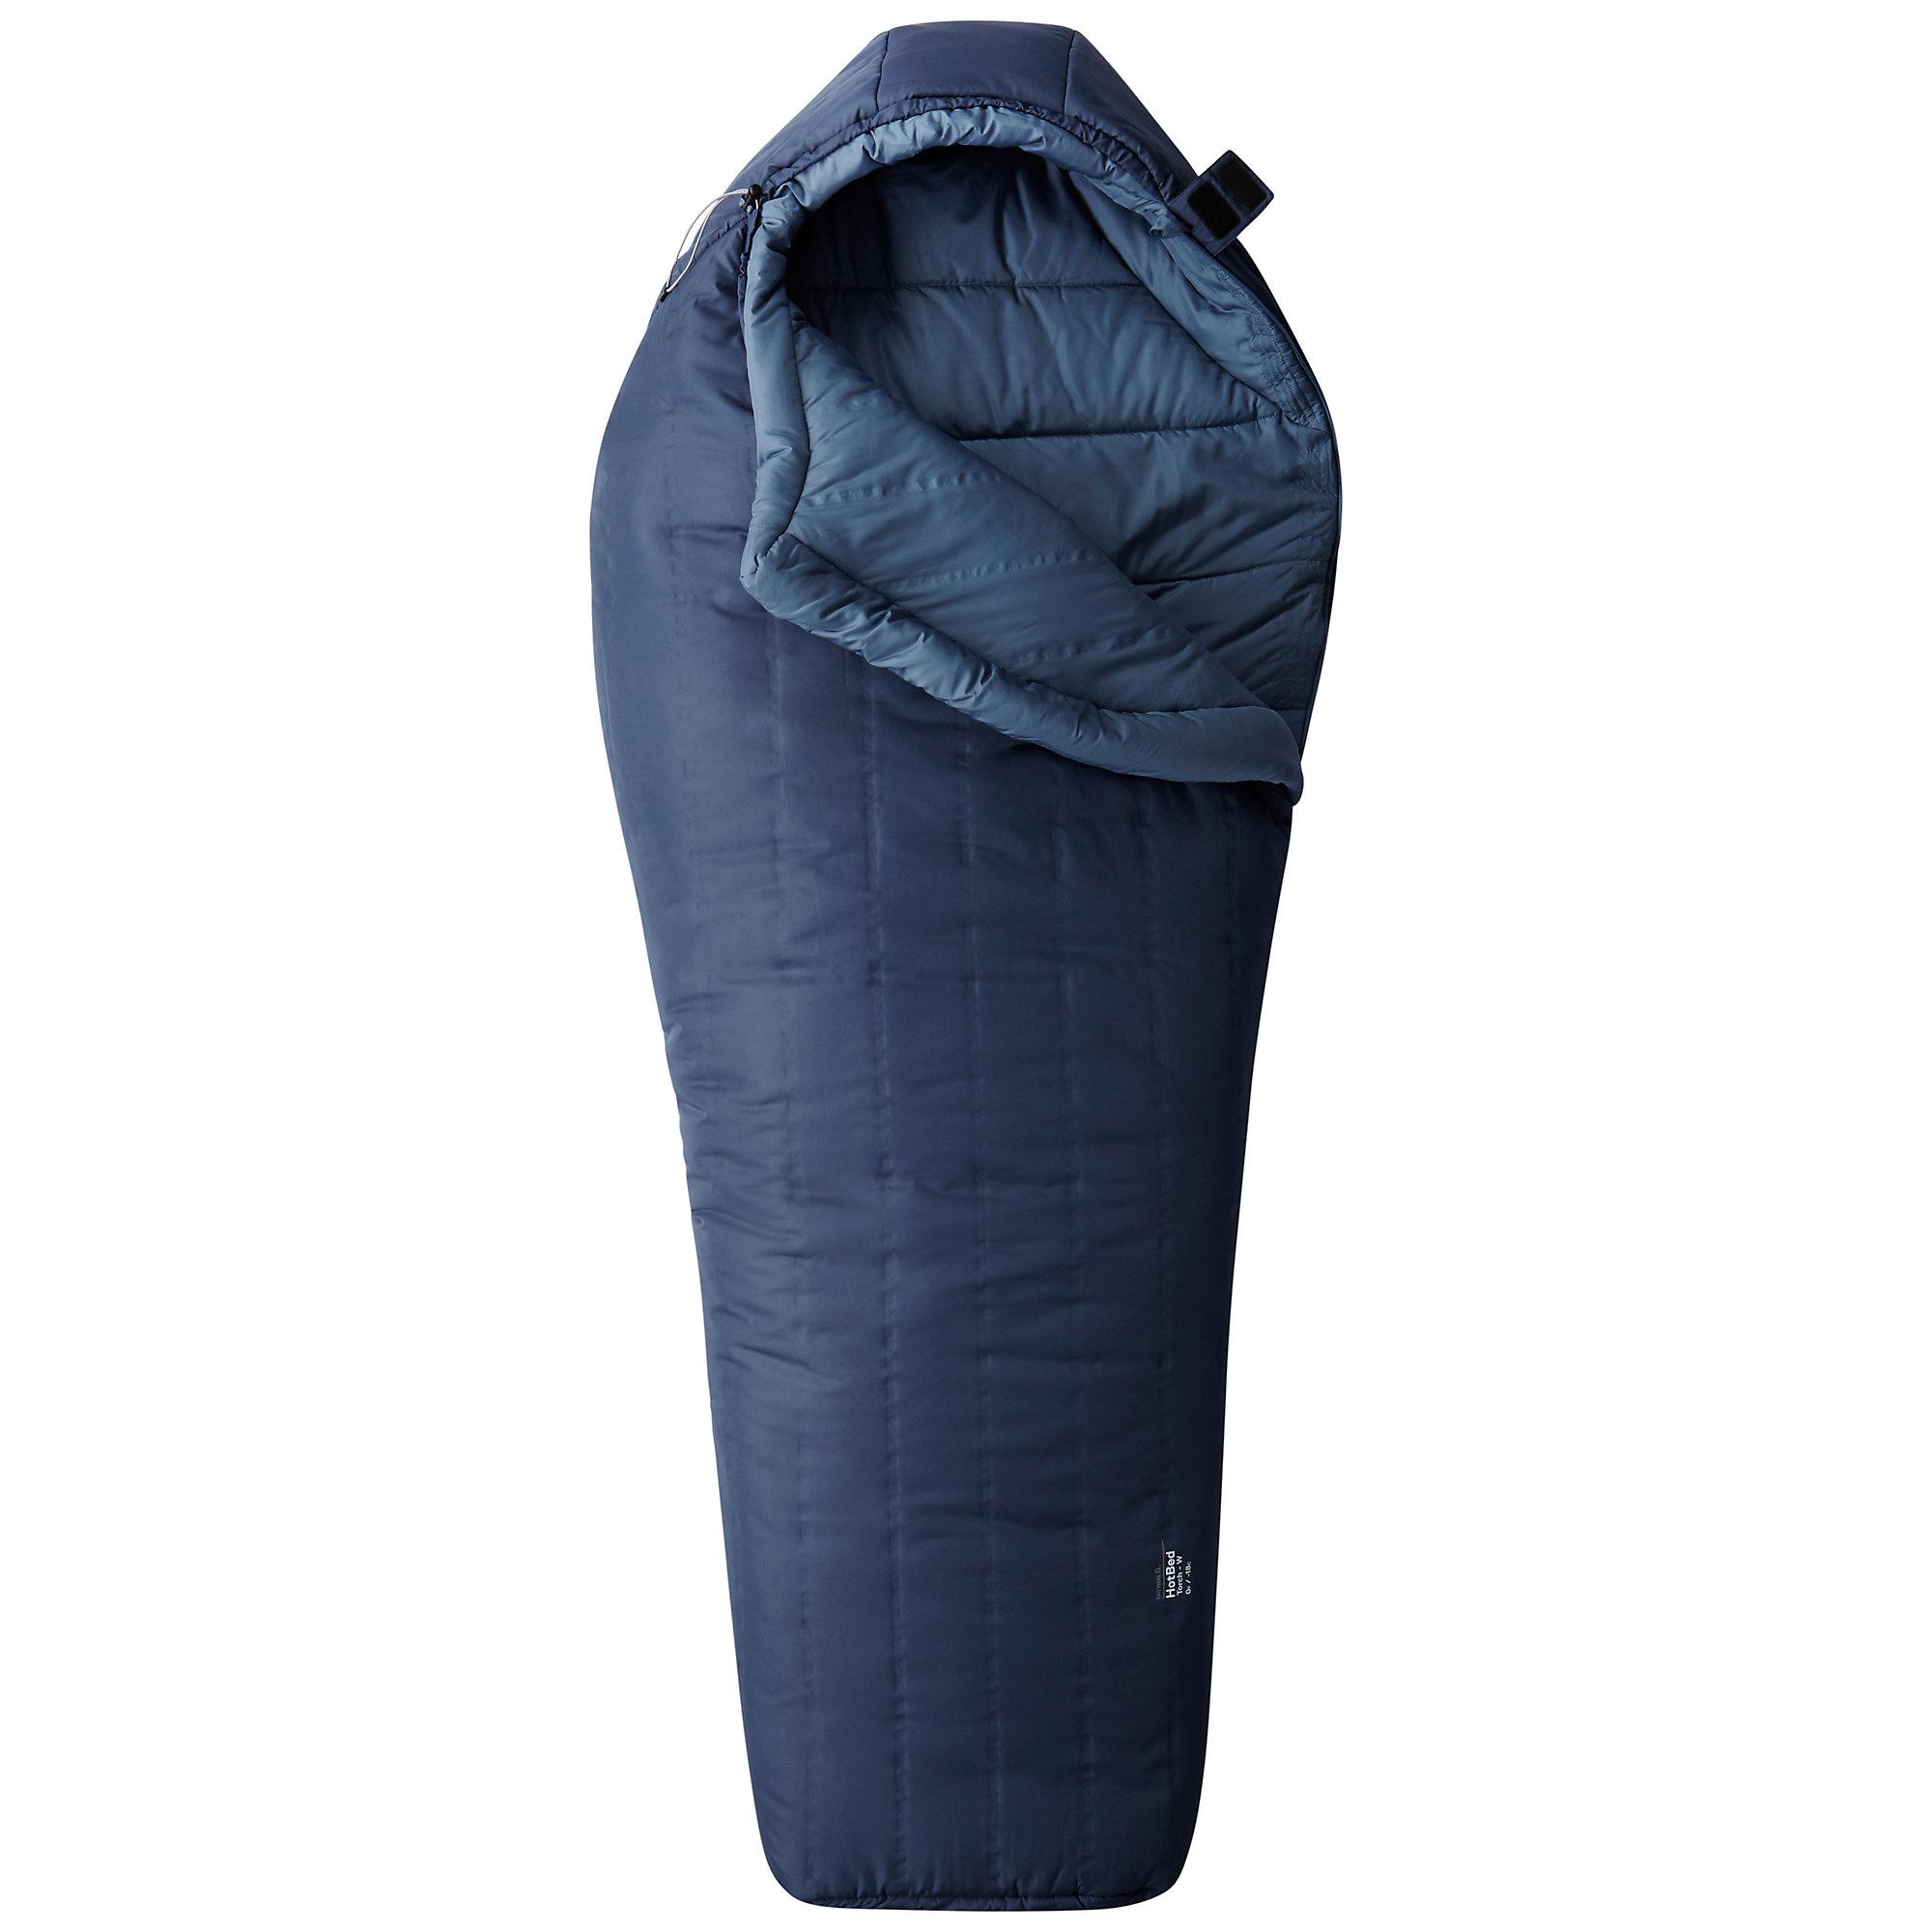 photo: Mountain Hardwear Women's Hotbed Torch 0° 3-season synthetic sleeping bag